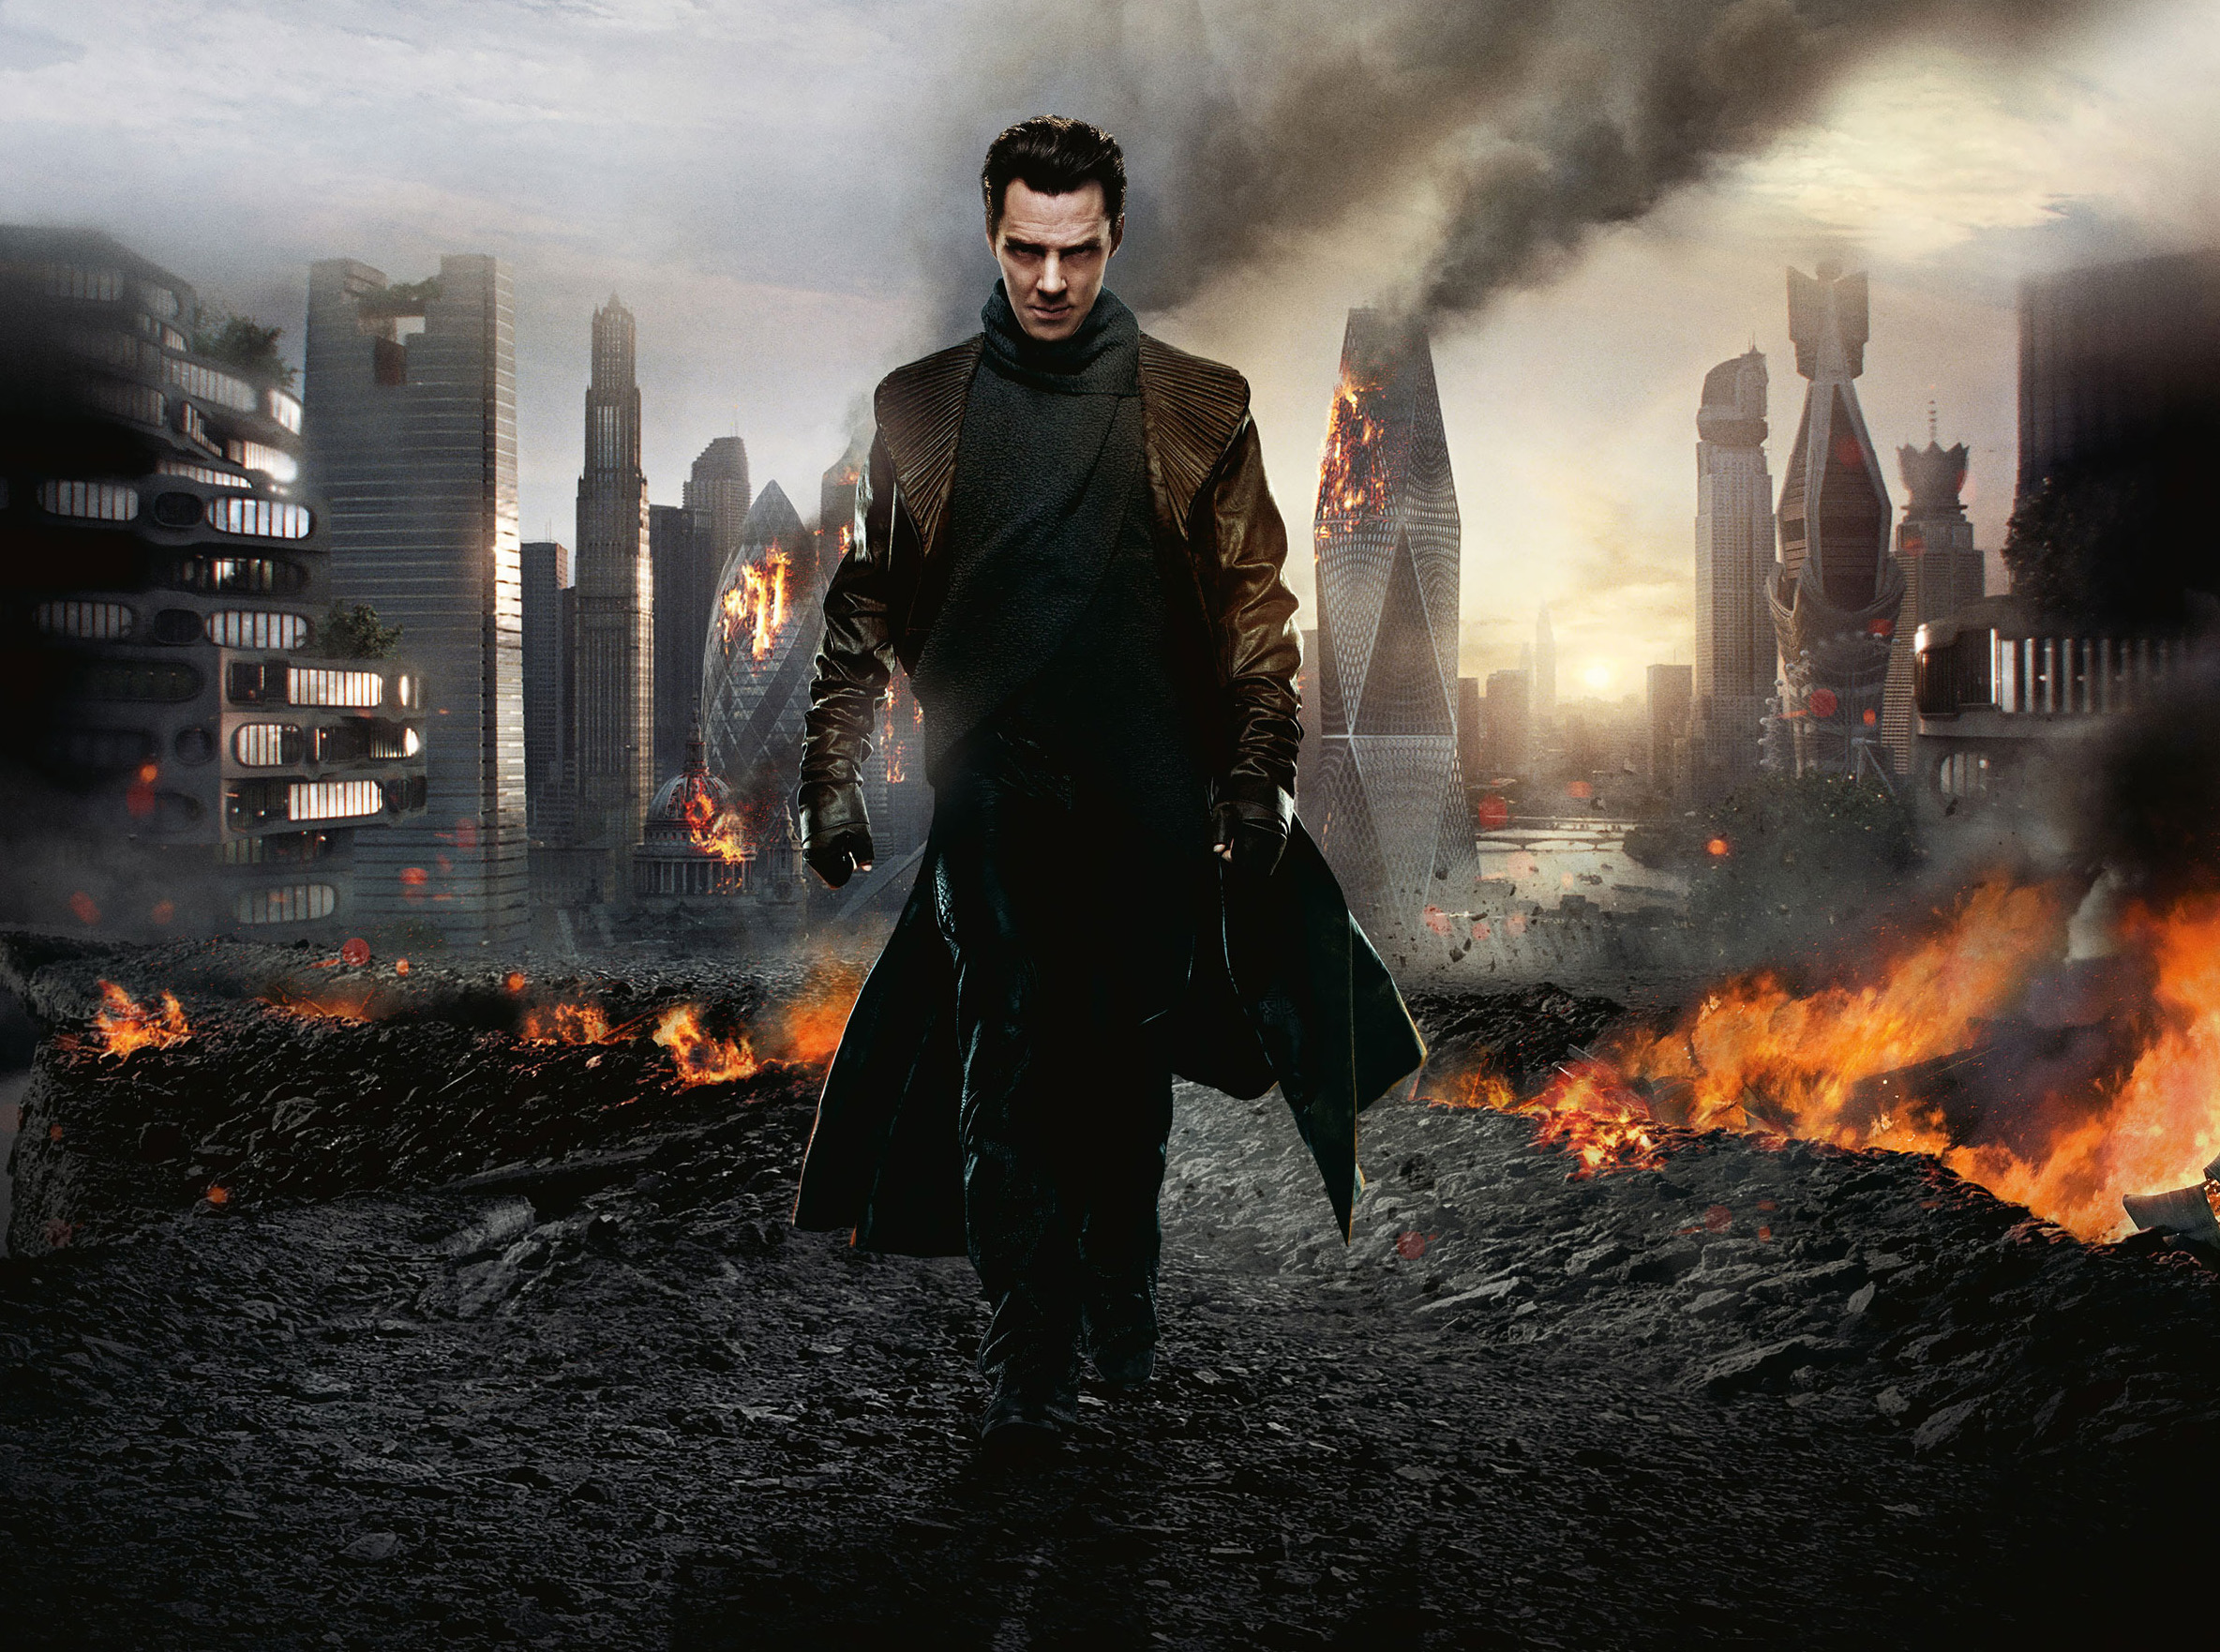 Is Benedict Cumberbatch's Khan in